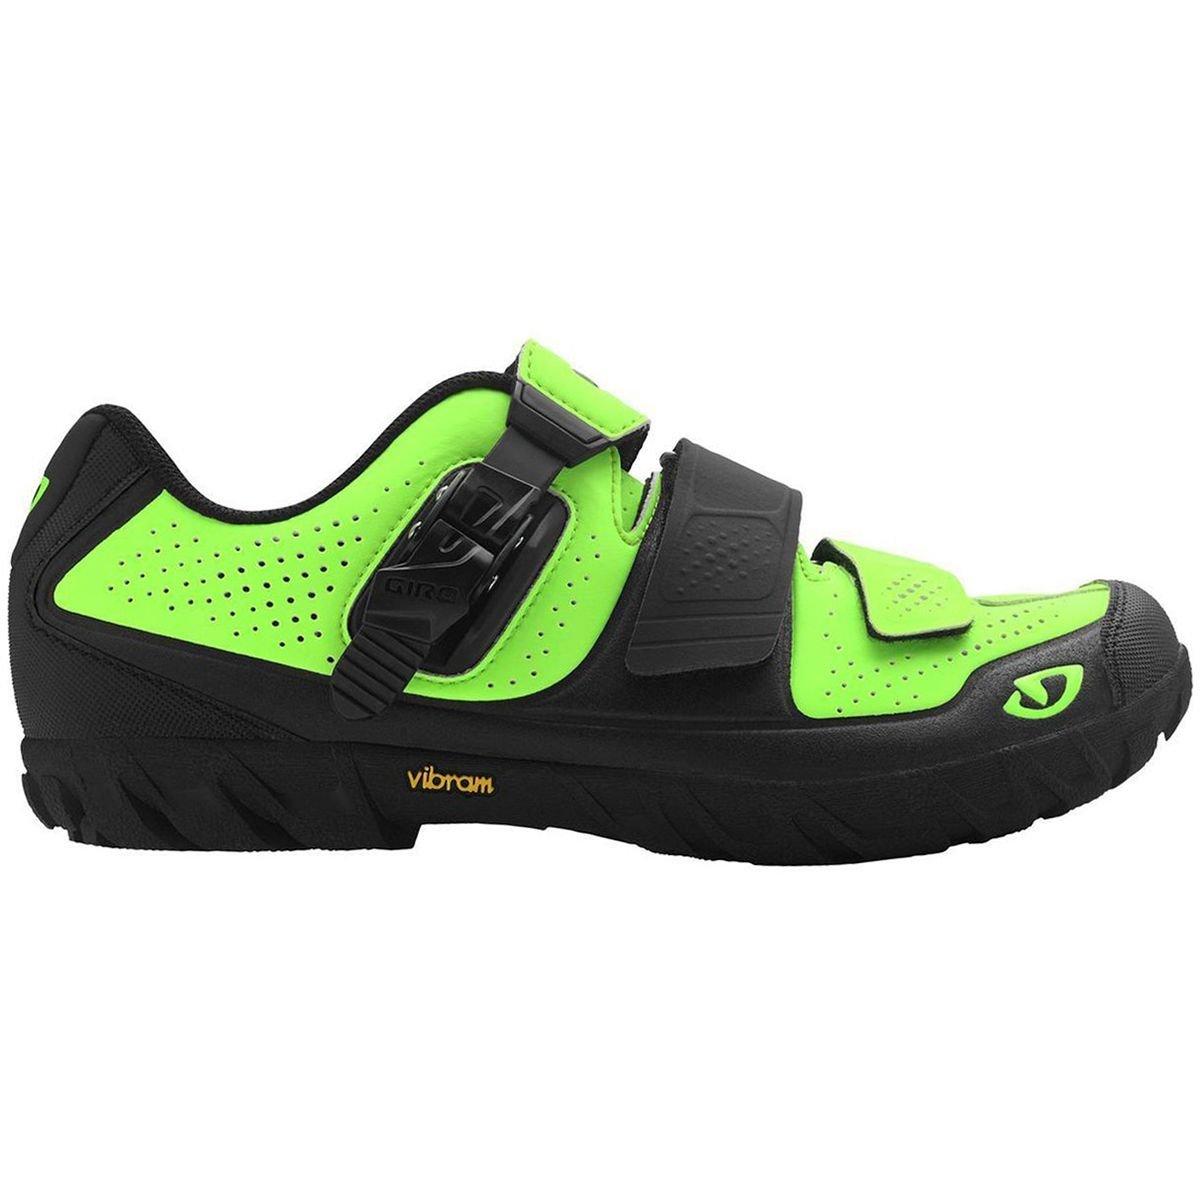 Giro Terraduro Cycling Shoes - Men's Lime/Black 39